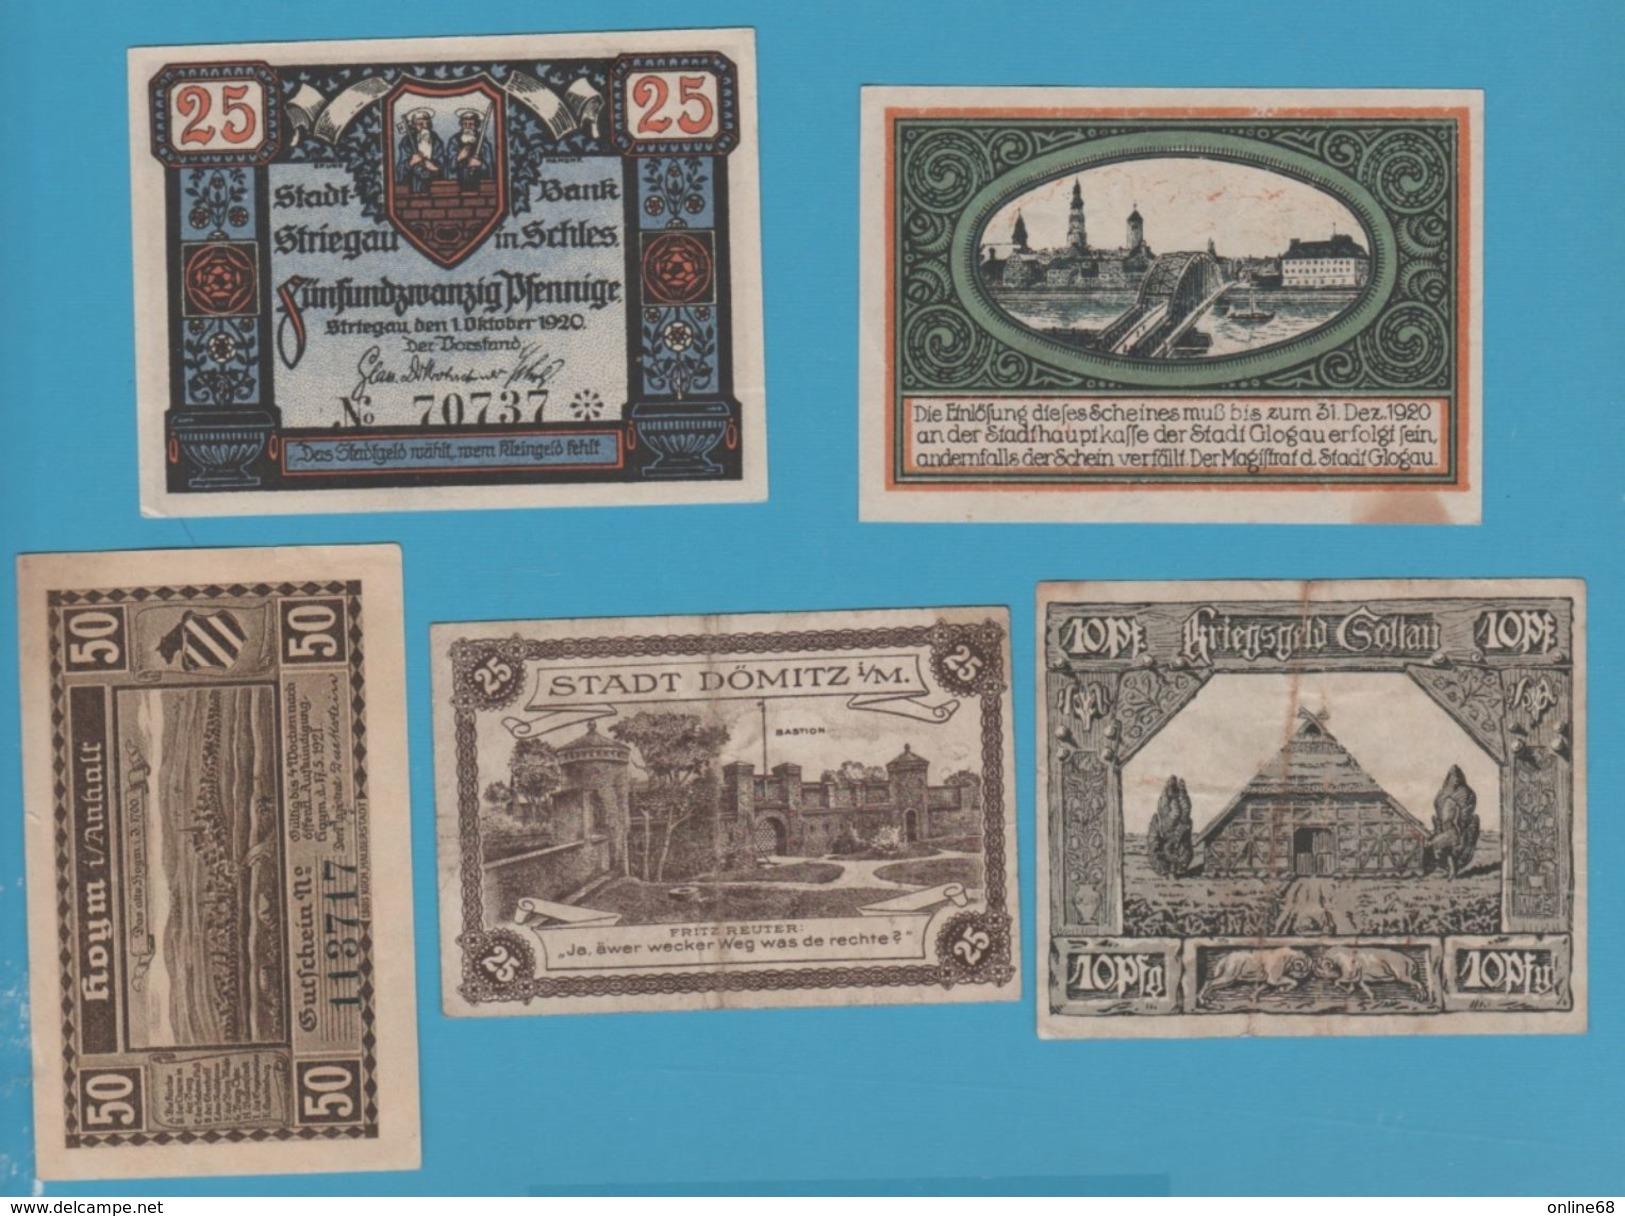 LOT 11 NOTGELD  HELGOLAND - STRIEGAU - DÖMITZ - SOLTAU - DARSTADT ..... - [11] Local Banknote Issues